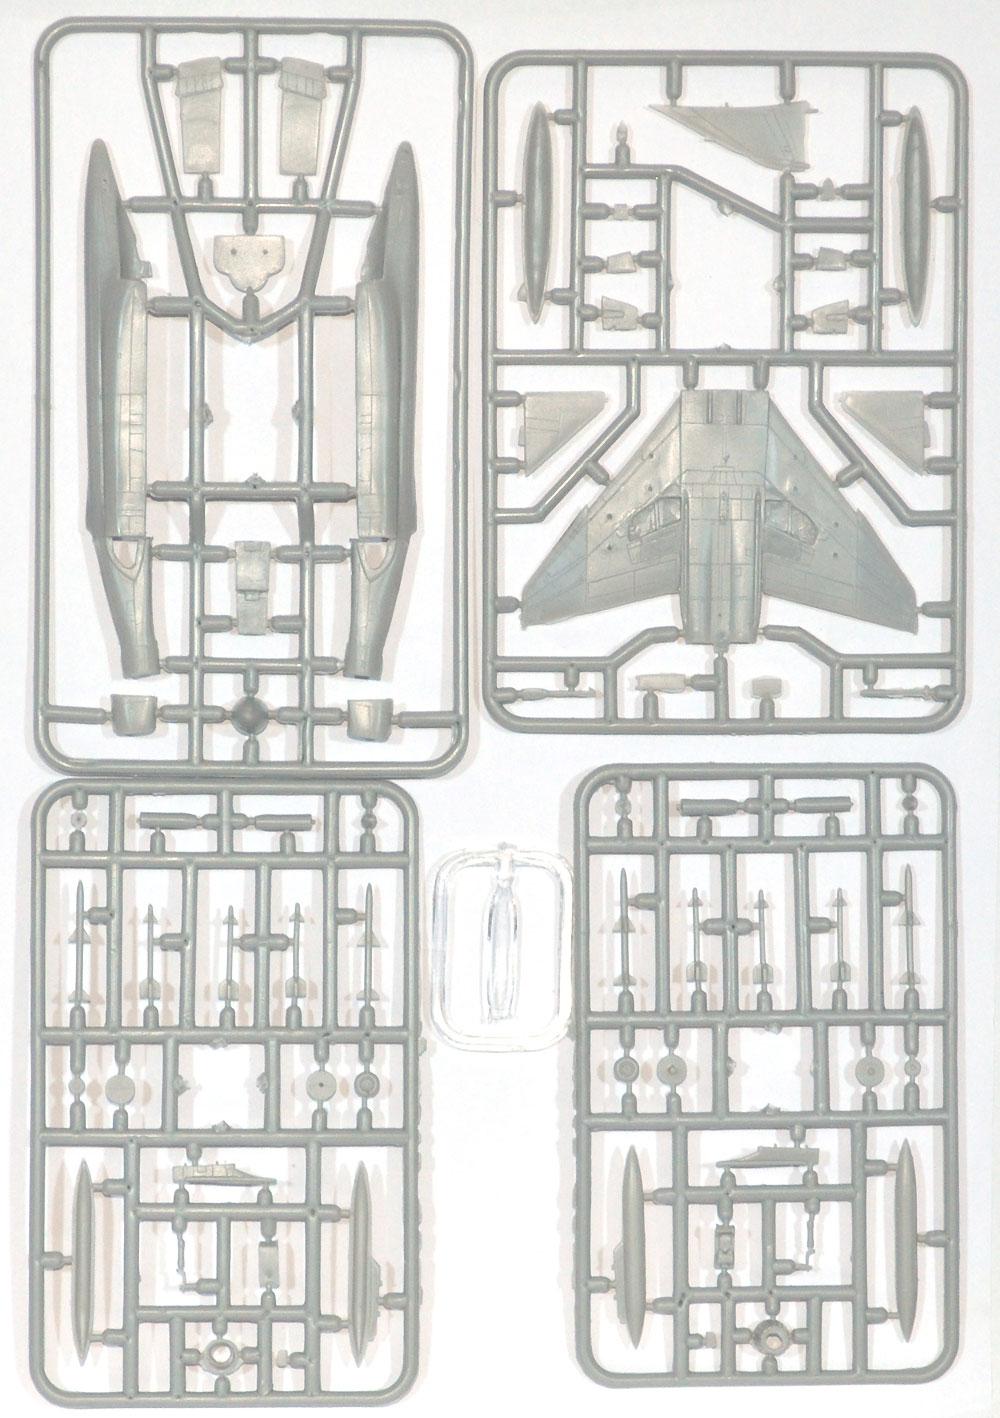 F-4J ファントム 2プラモデル(ソヴァ M1/144 エアクラフトNo.SVM-14001)商品画像_2